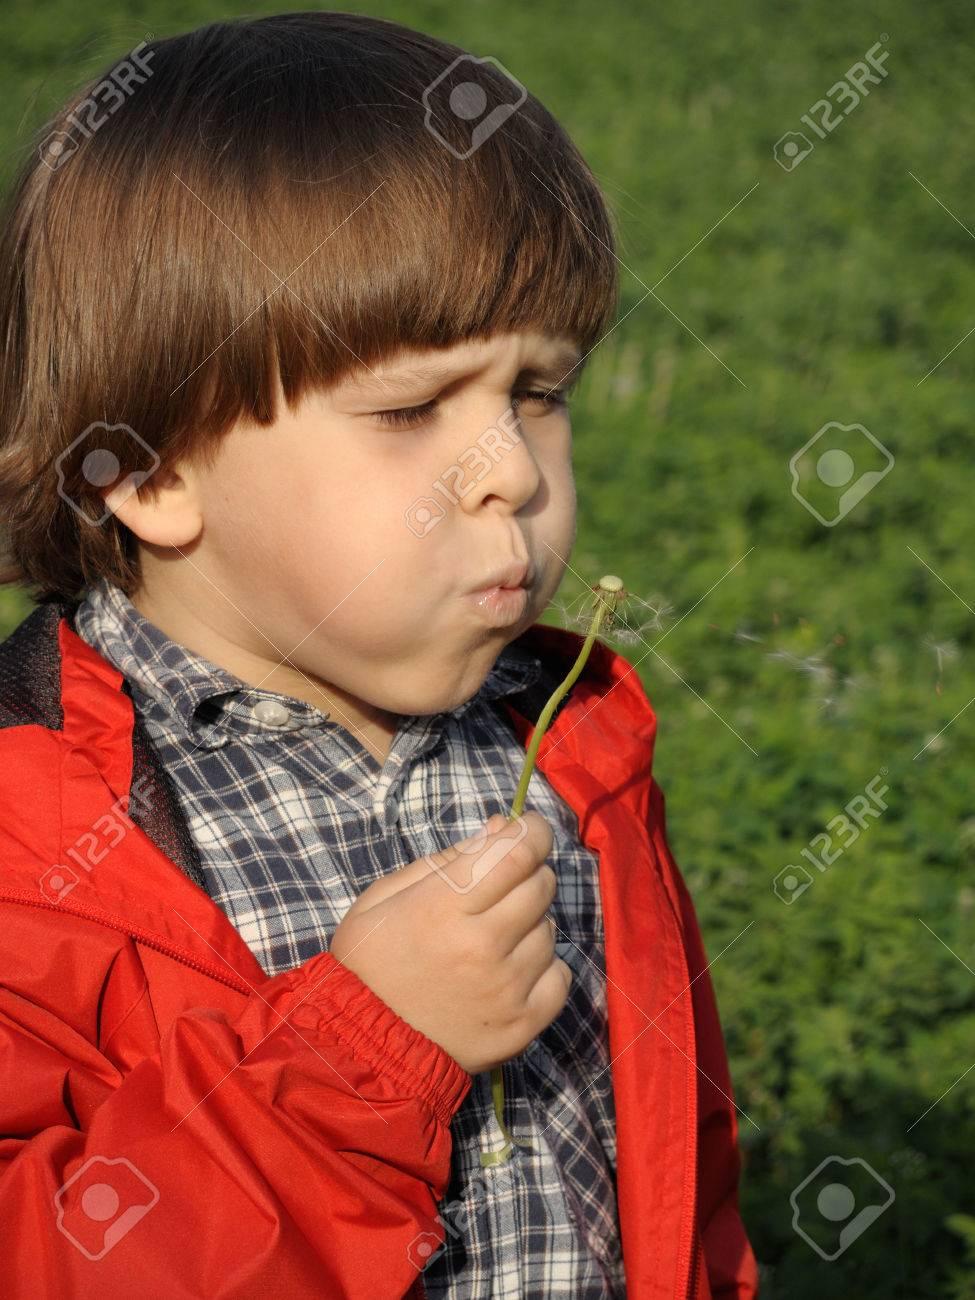 Beautiful little boy blowing dandelion. Happiness, fashionable concept. - 43075950